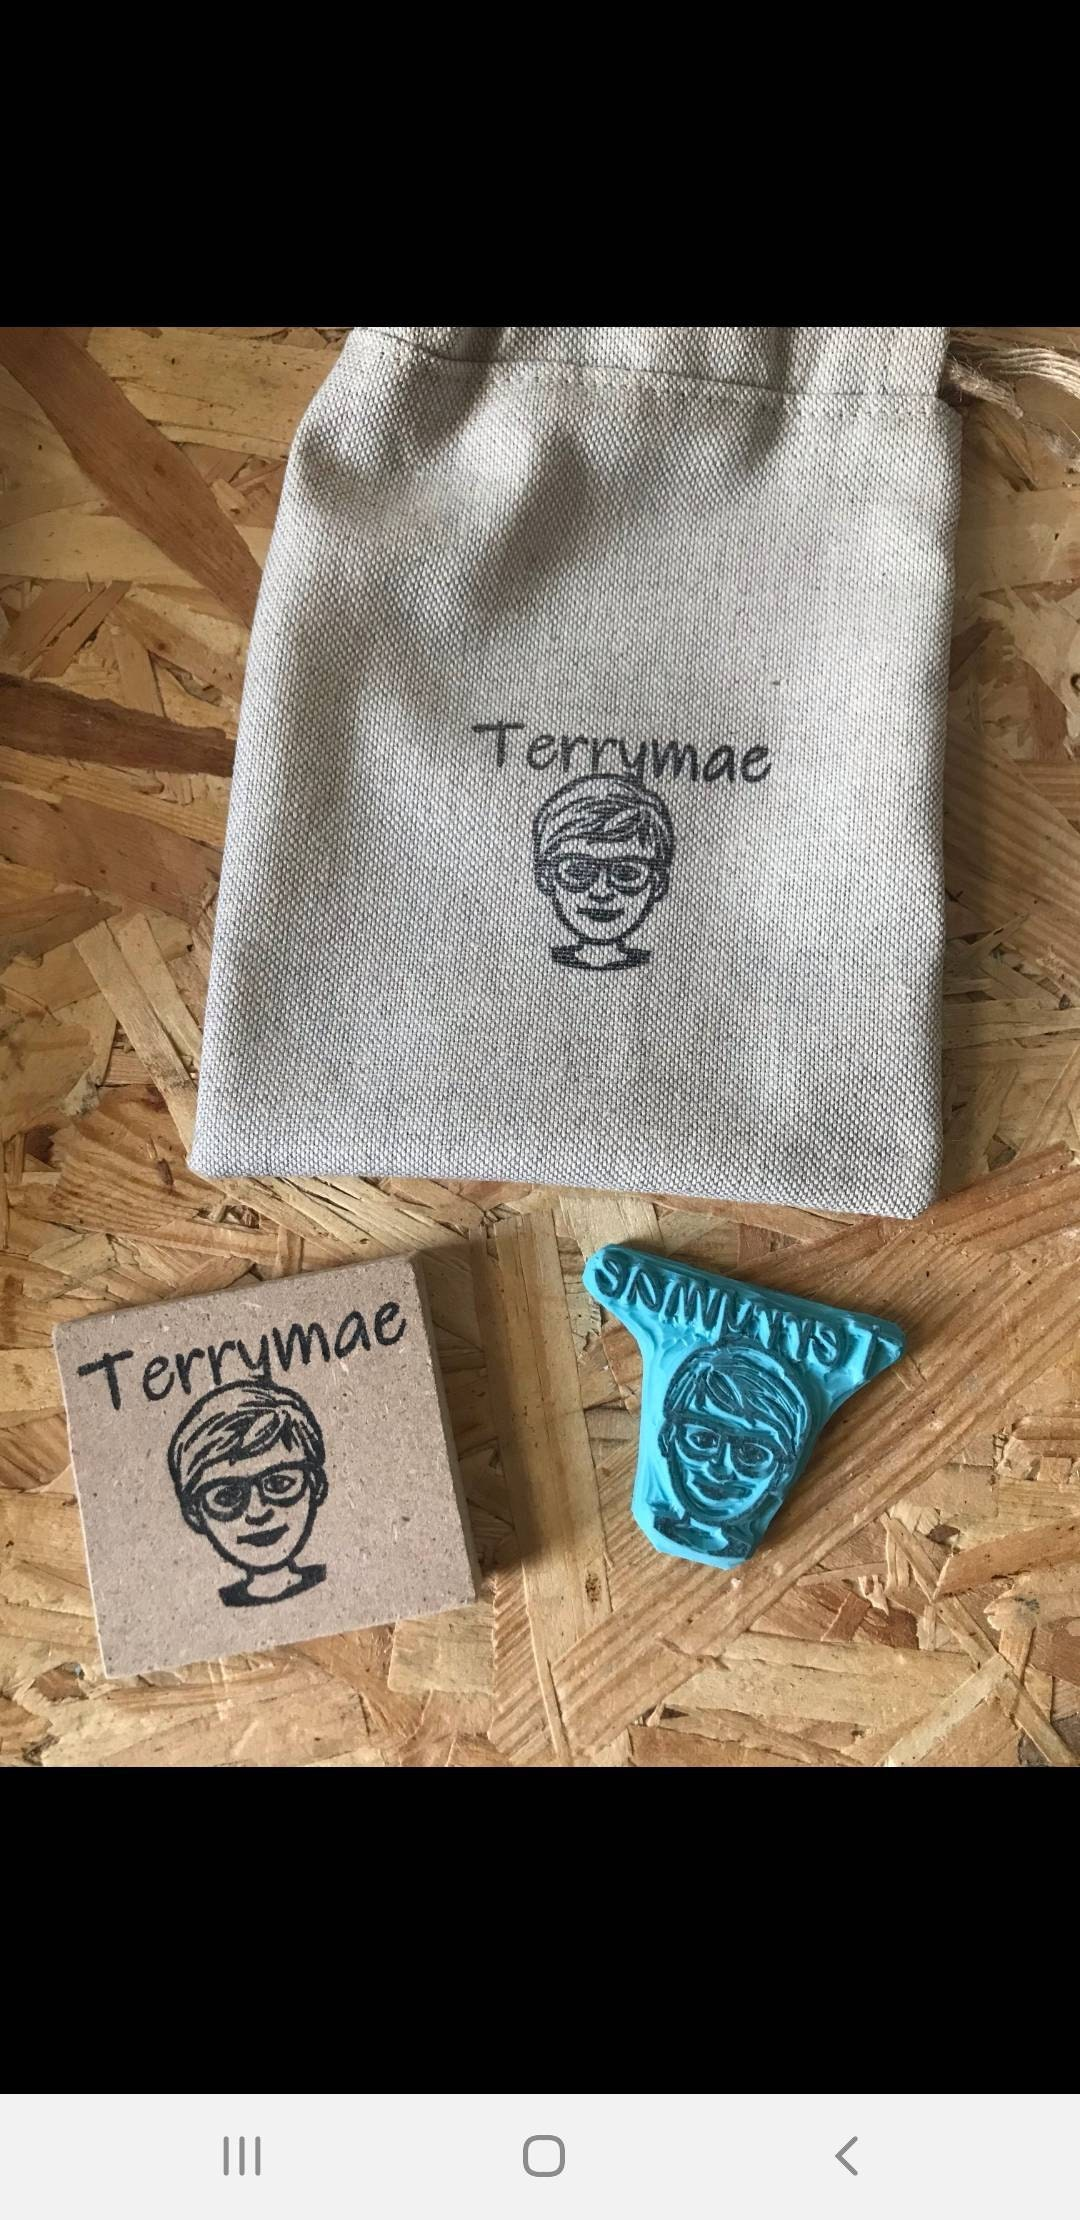 Teerymae added a photo of their purchase